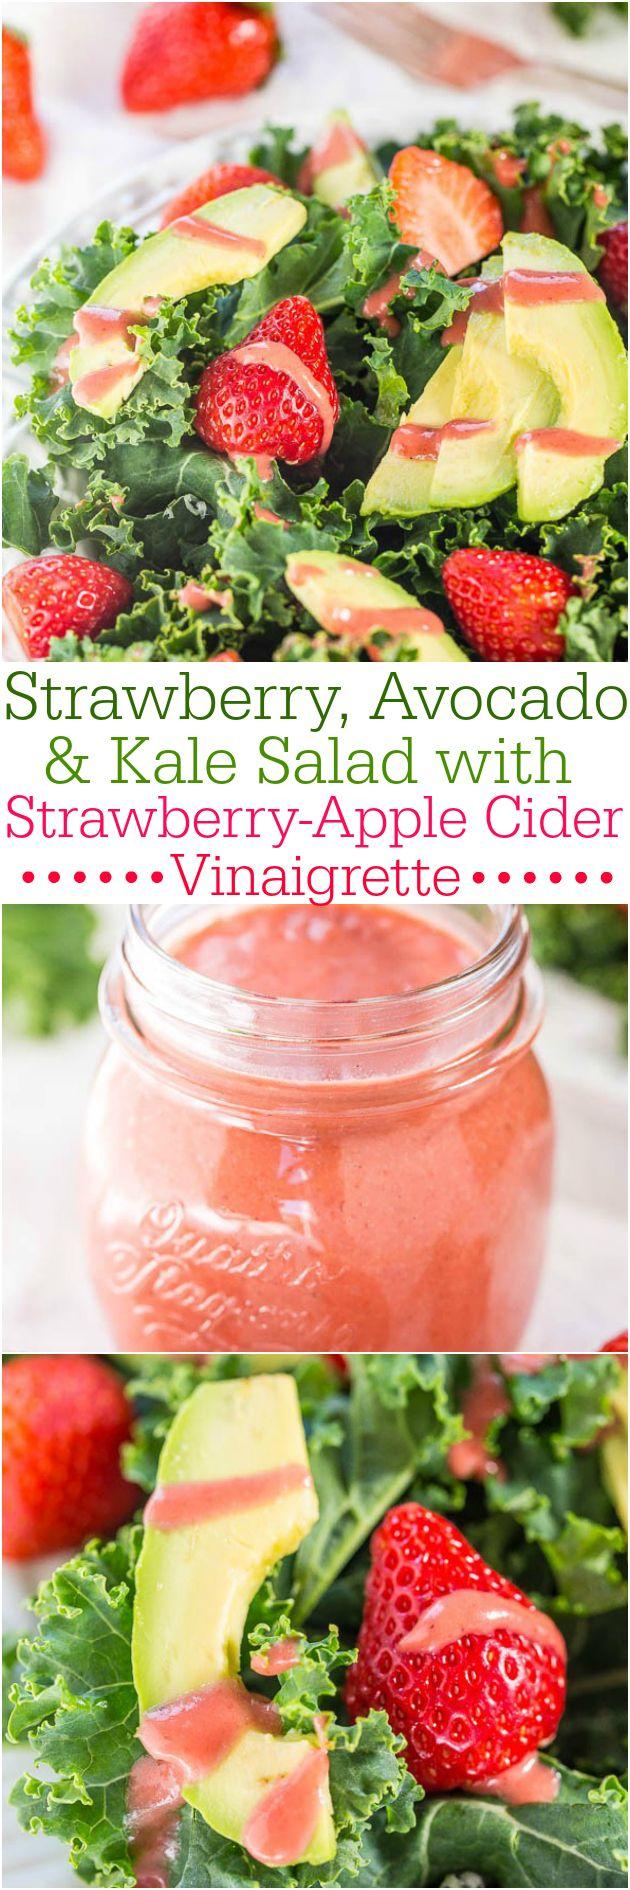 Strawberry, Avocado, and Kale Salad with Strawberry-Apple Cider Vinaigrette…